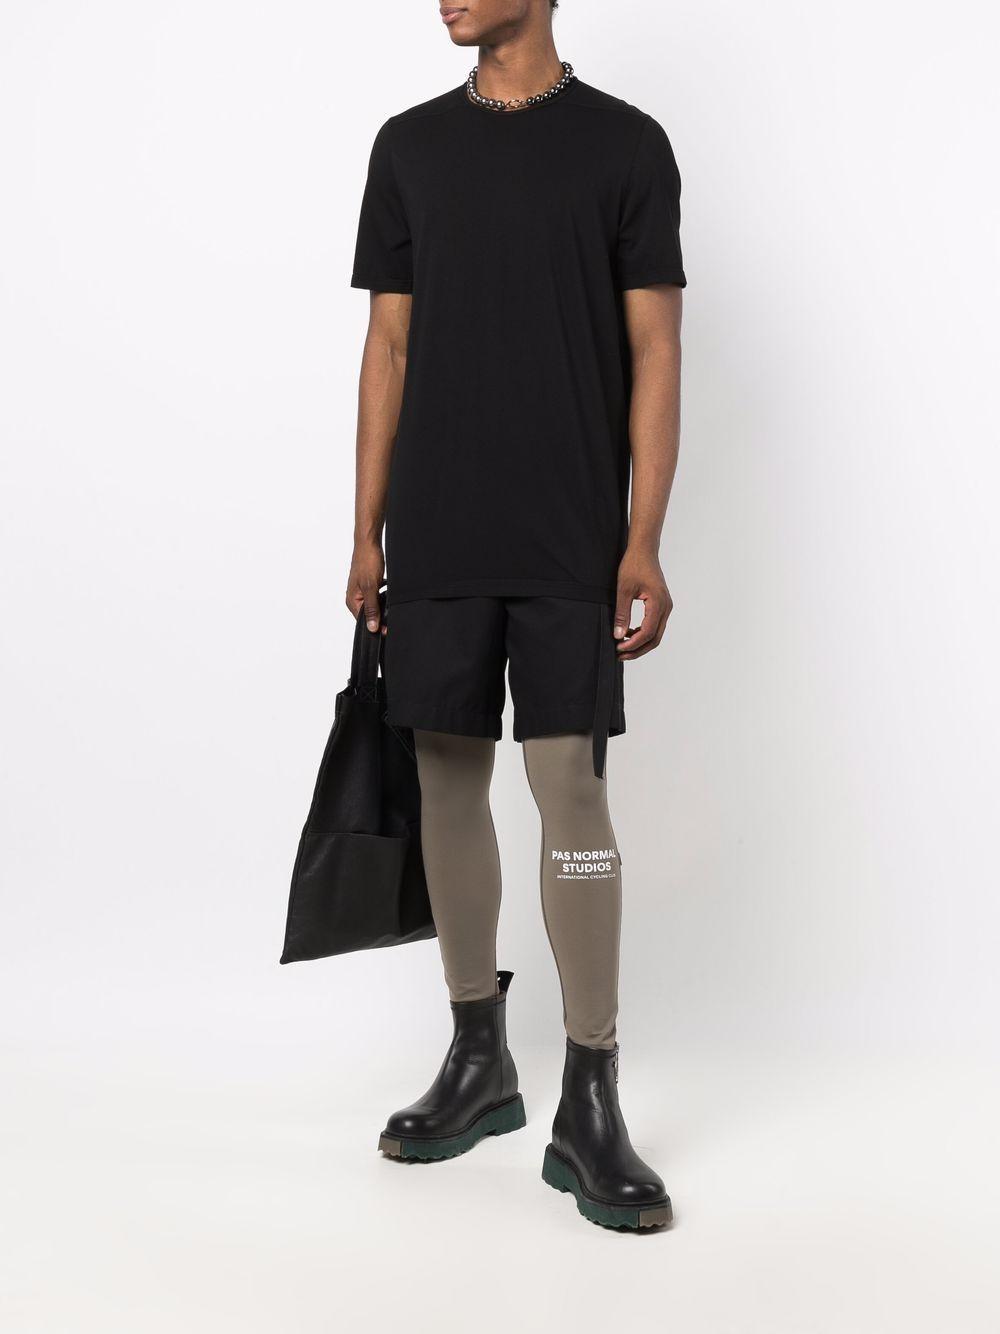 organic cotton t-shirt man black RICK OWENS DRKSHDW | T-shirts | DU02A3250 RN09